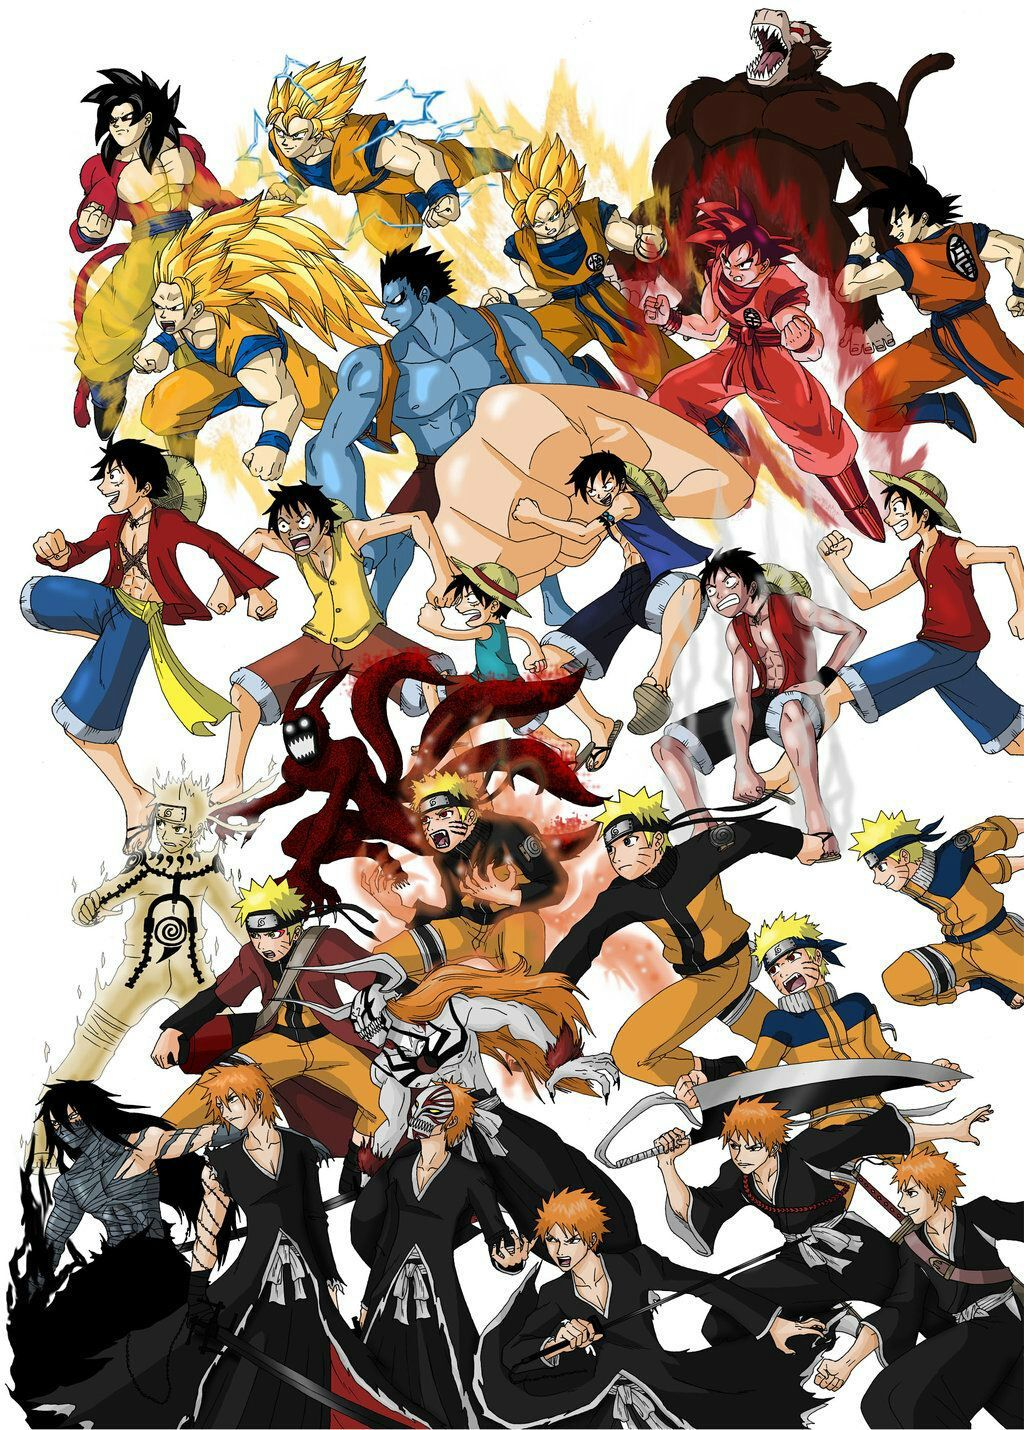 Mi Galeria Rara I Cosas Raras Anime Anime Crossover Anime Character Design